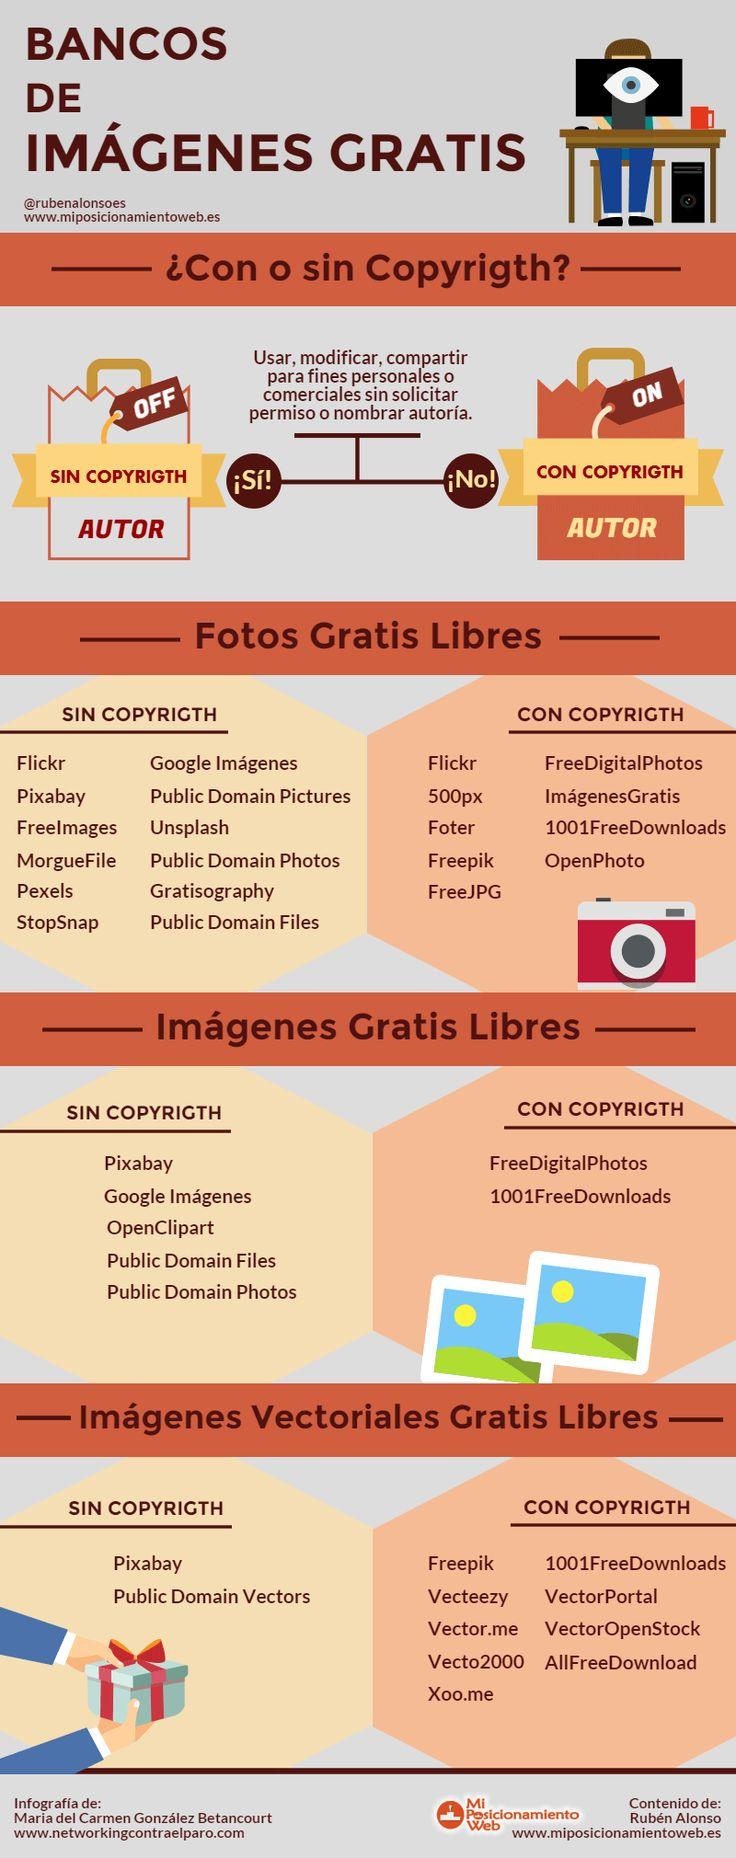 BANCOS DE IMÁGENES GRATIS #INFOGRAFIA #INFOGRAPHIC #DESIGN